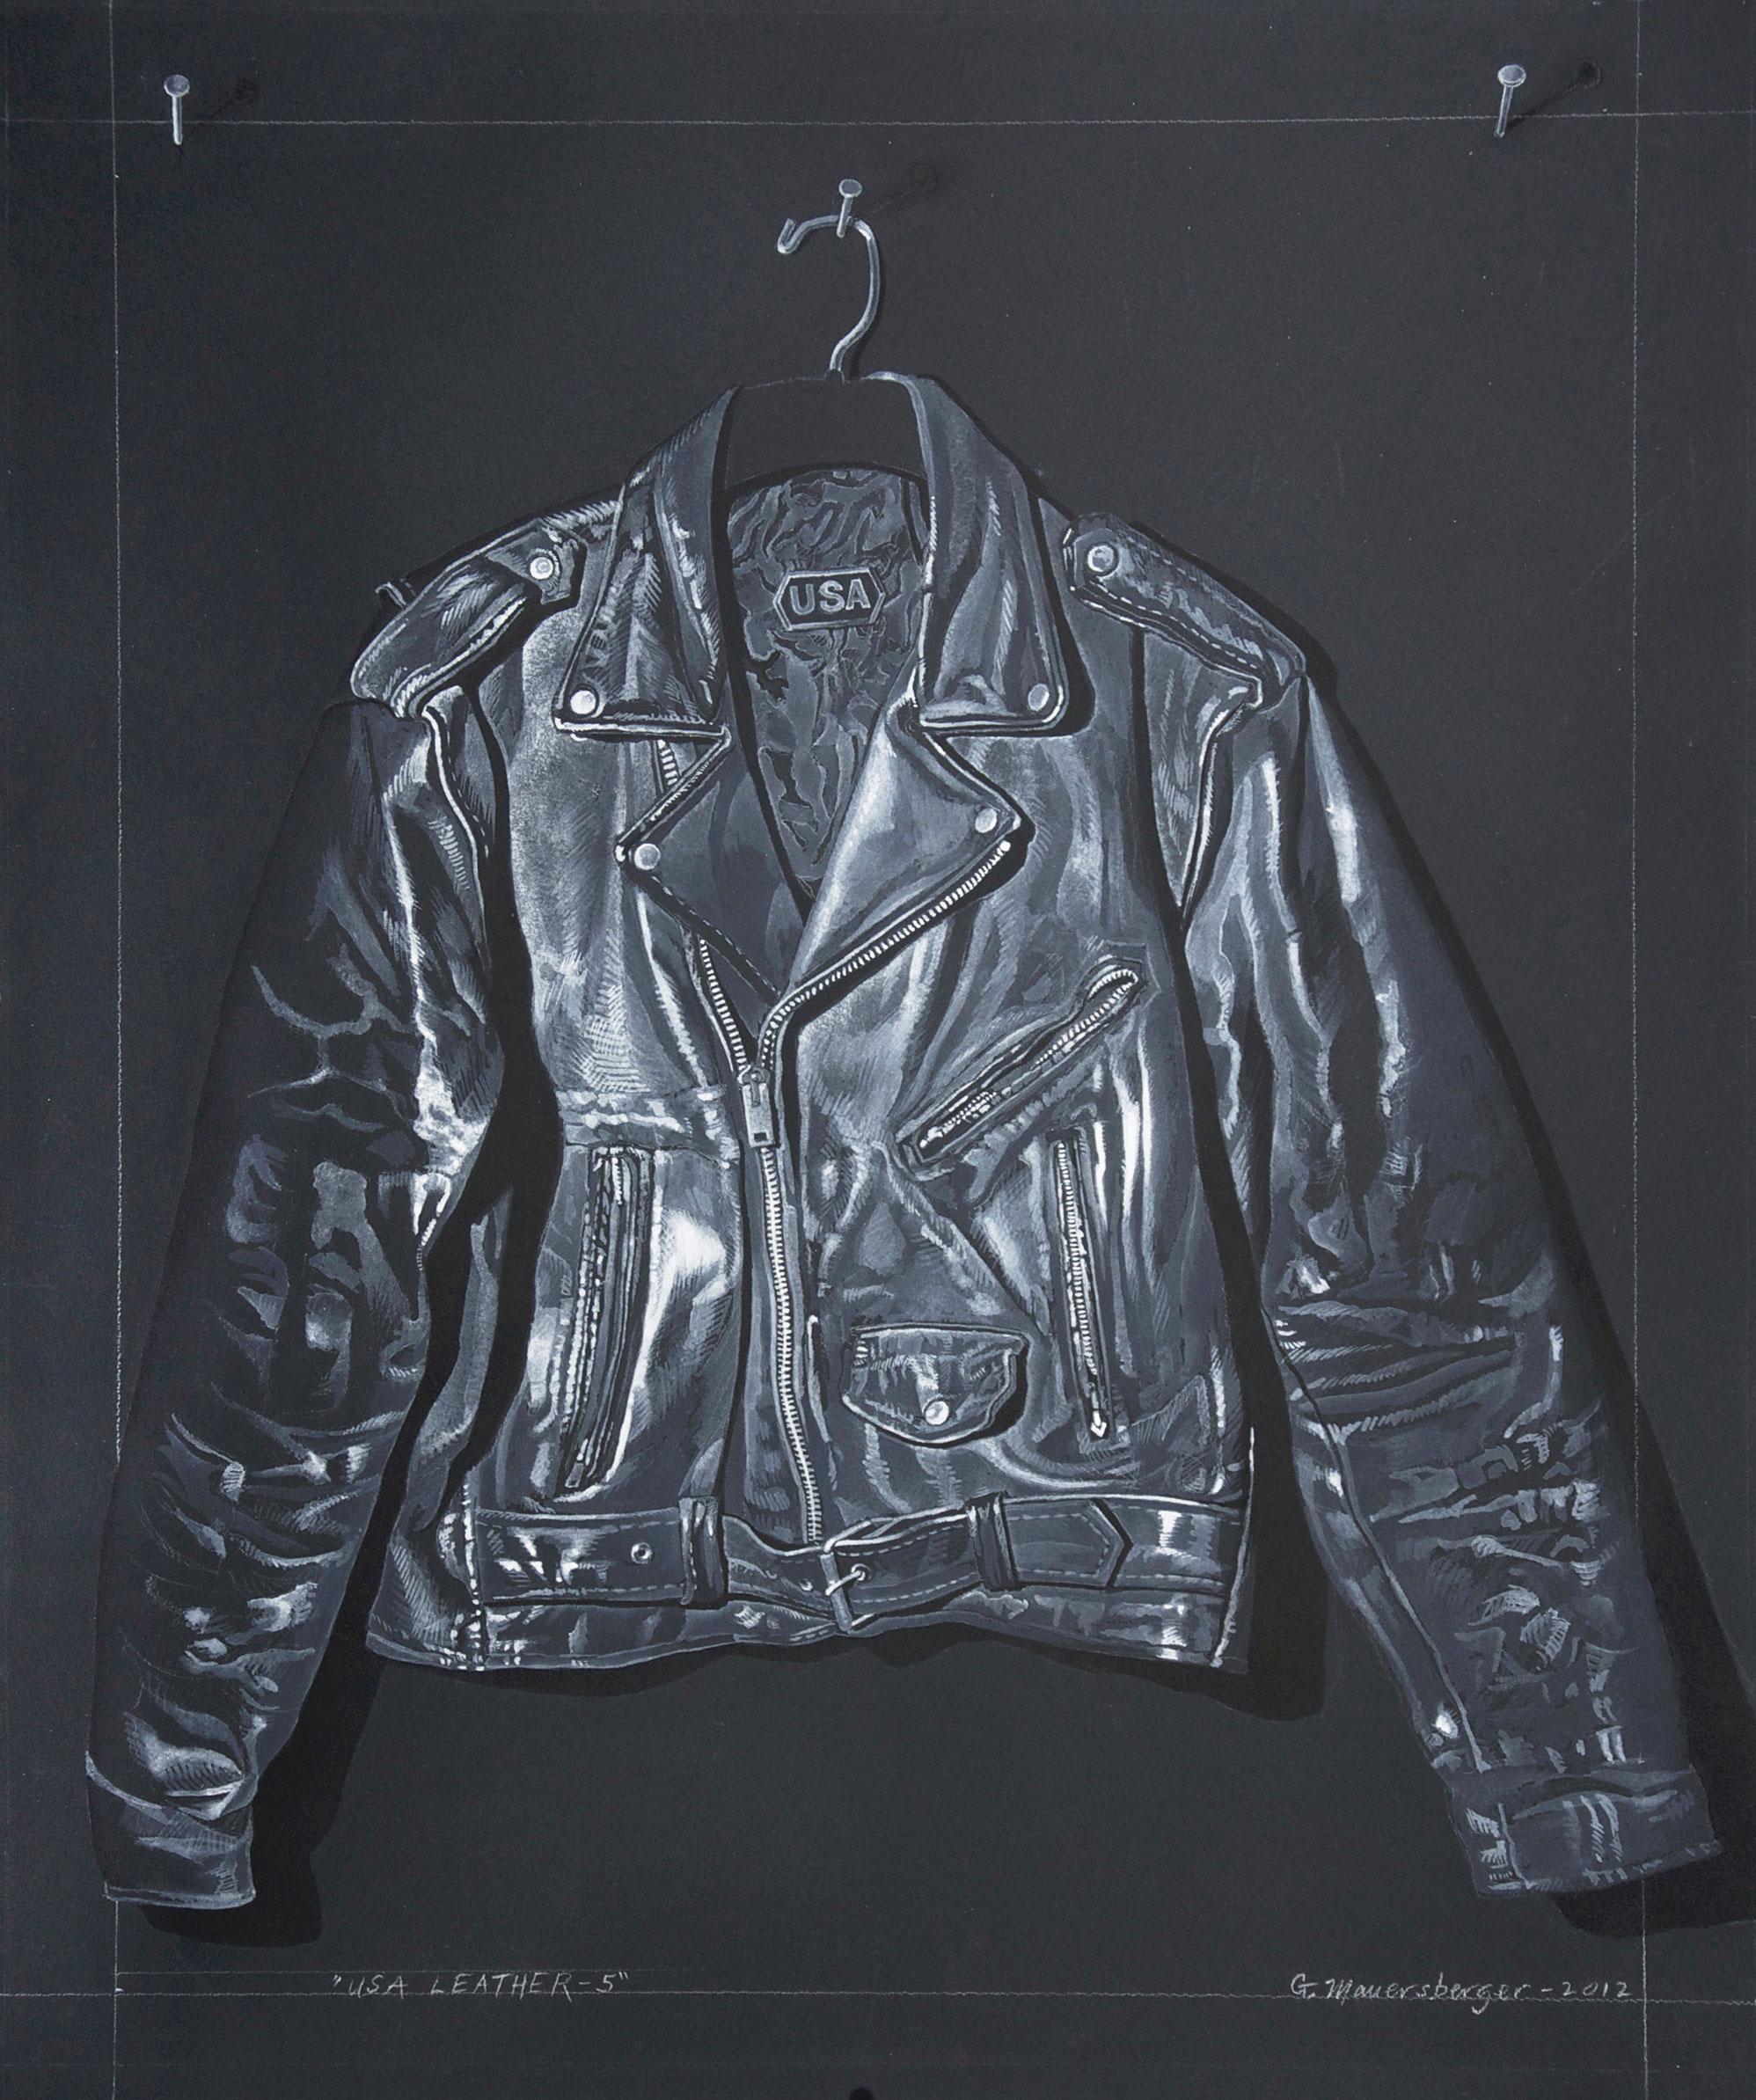 USA Leather 5